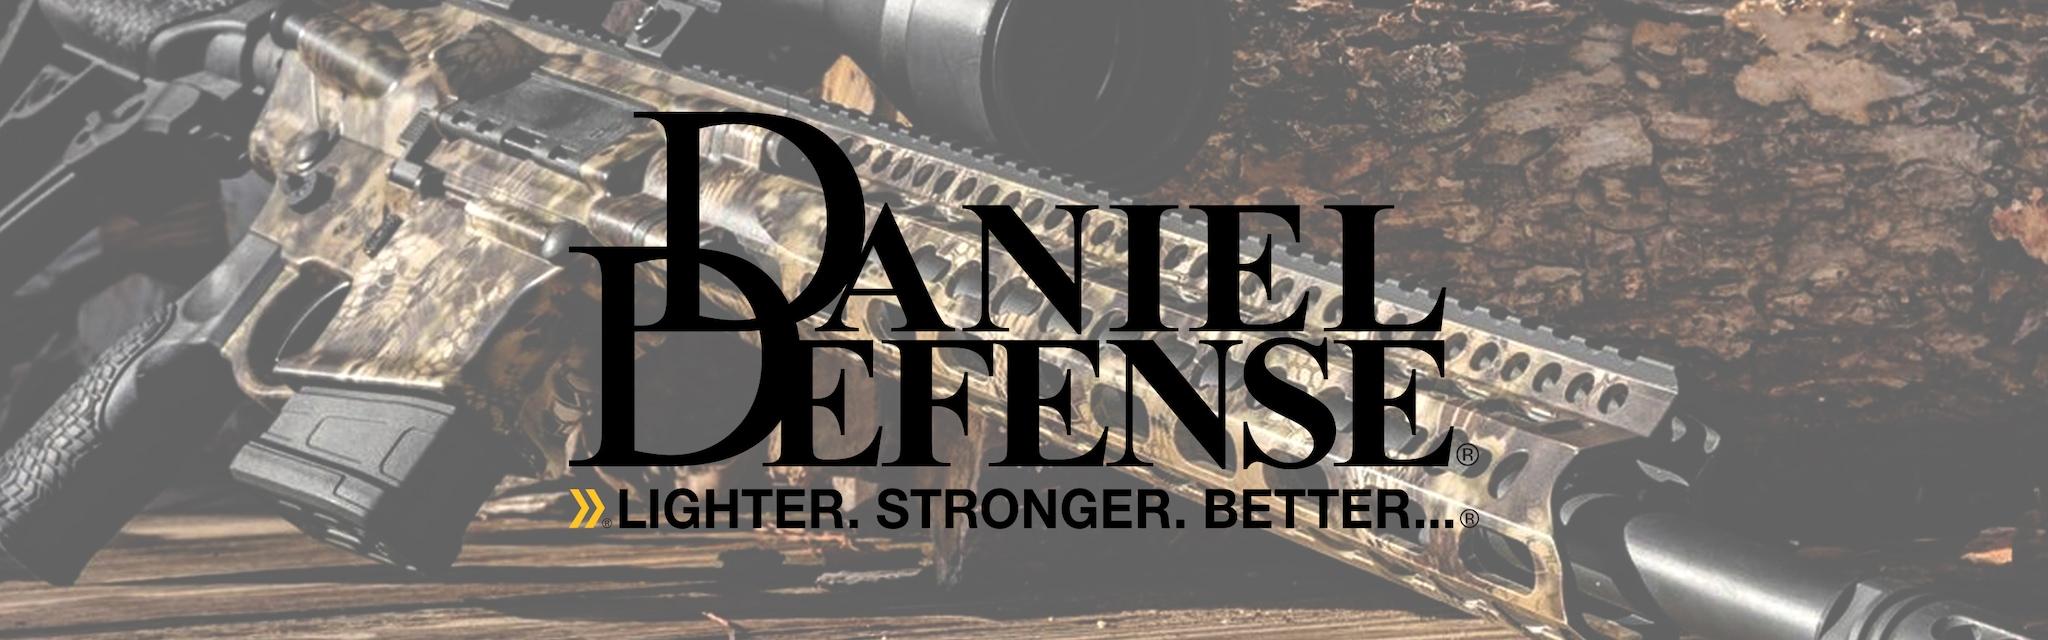 DANIEL DEFENSE BRAND BANNER